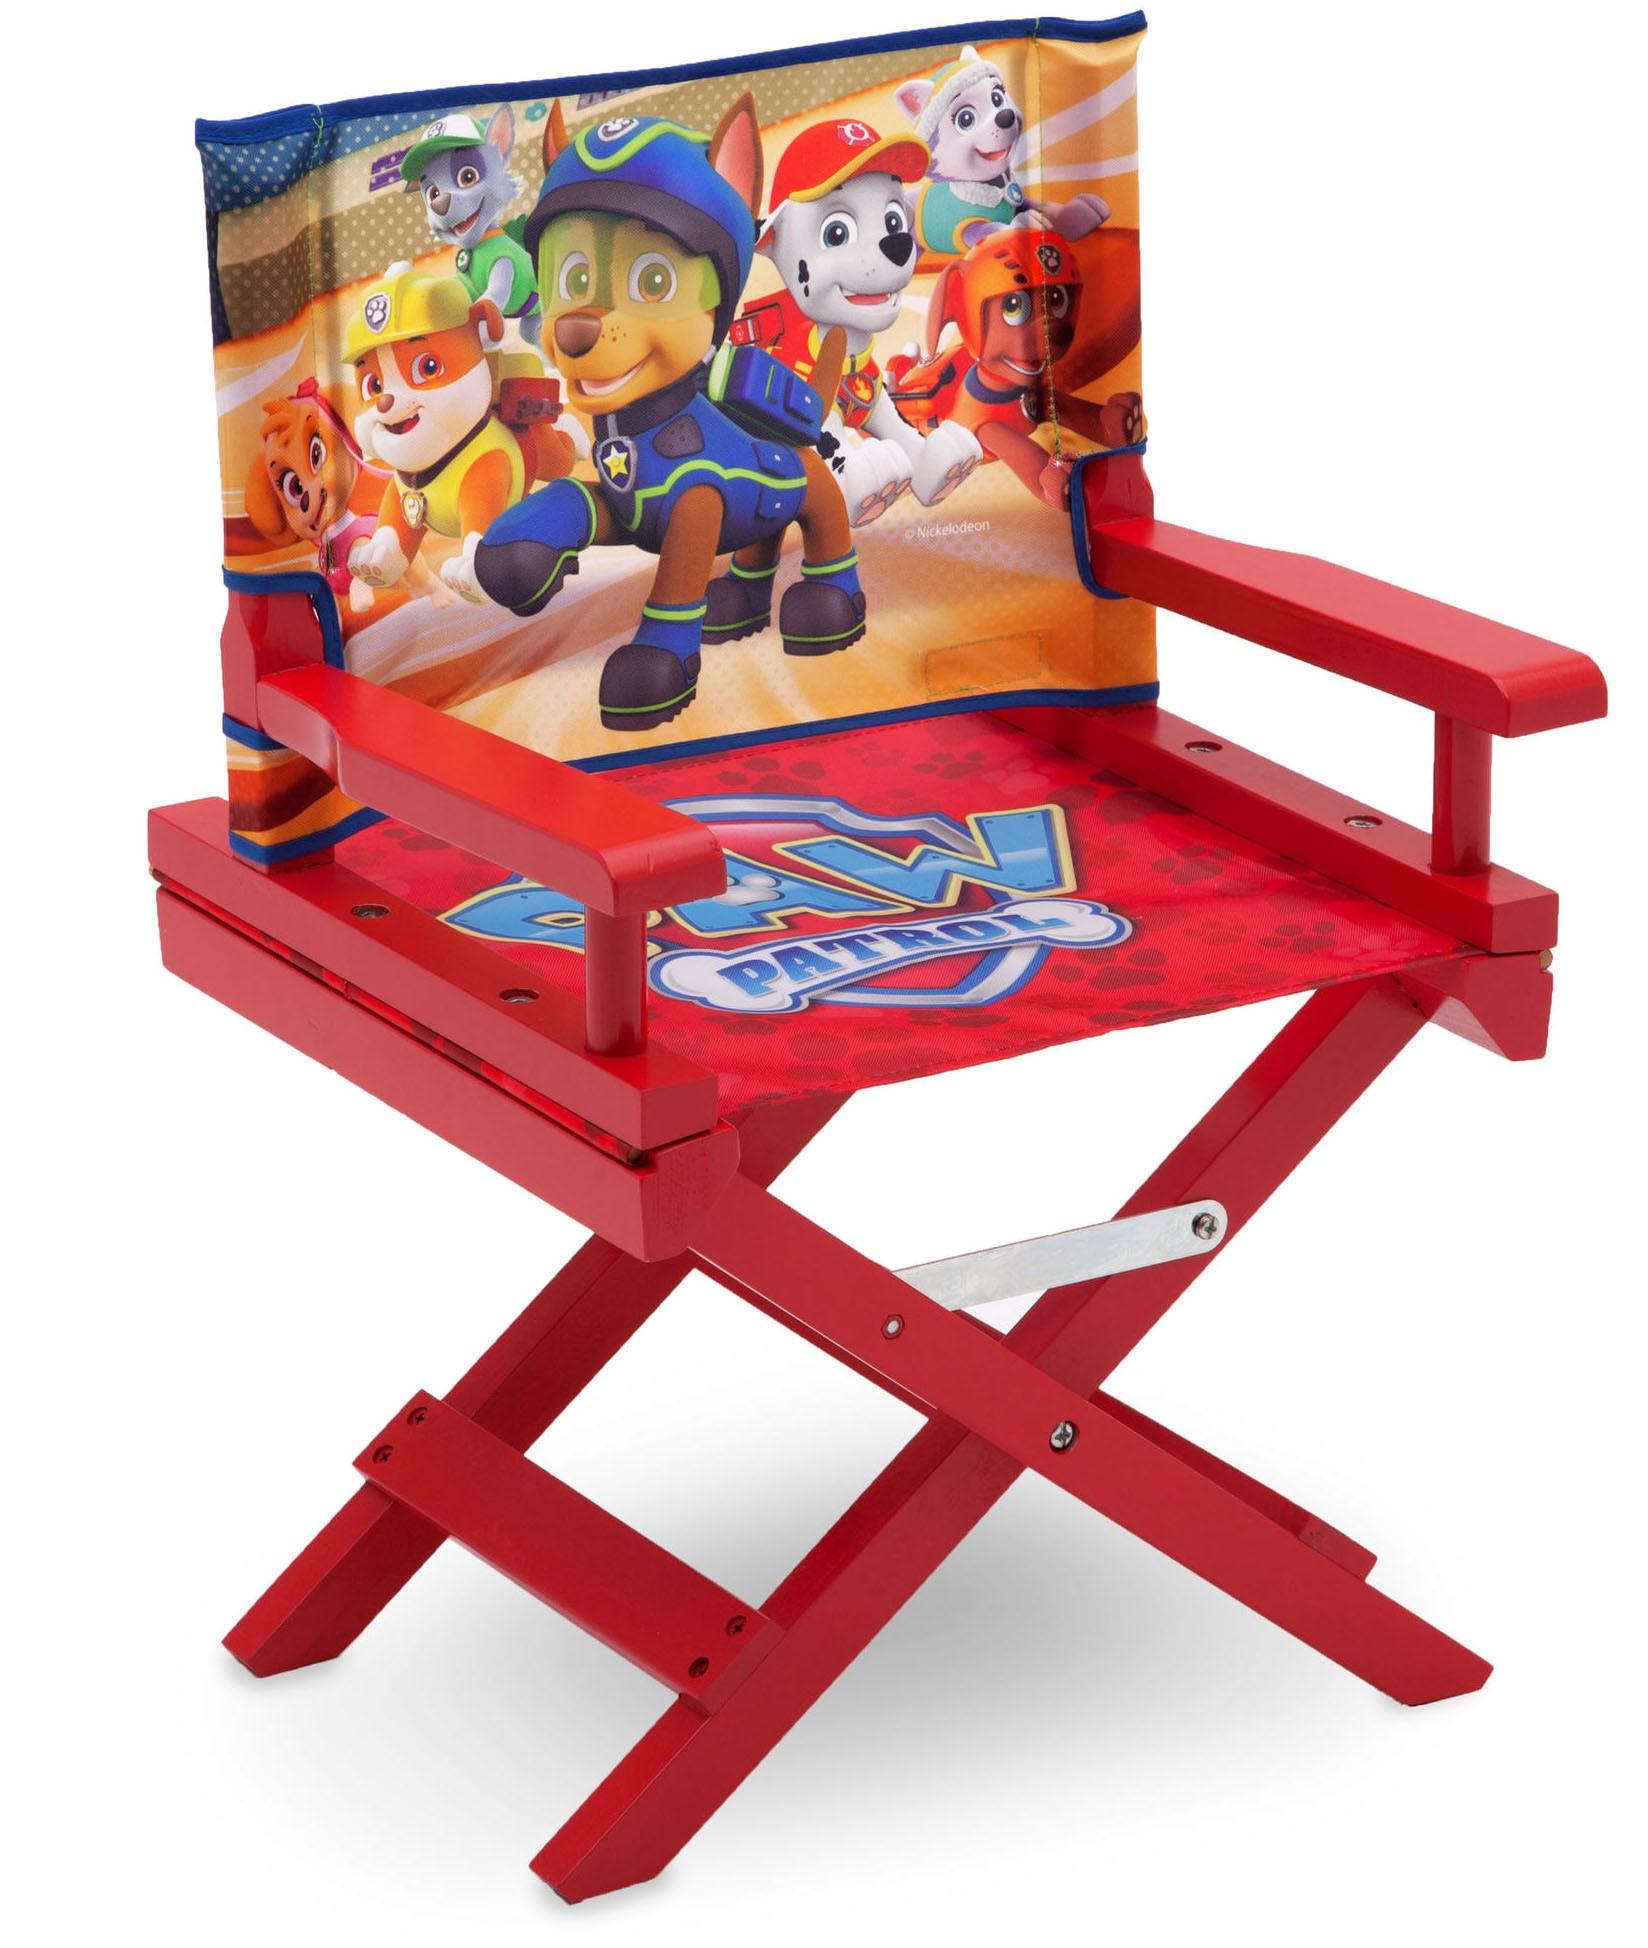 Scaun Pentru Copii Paw Patrol Director's Chair imagine